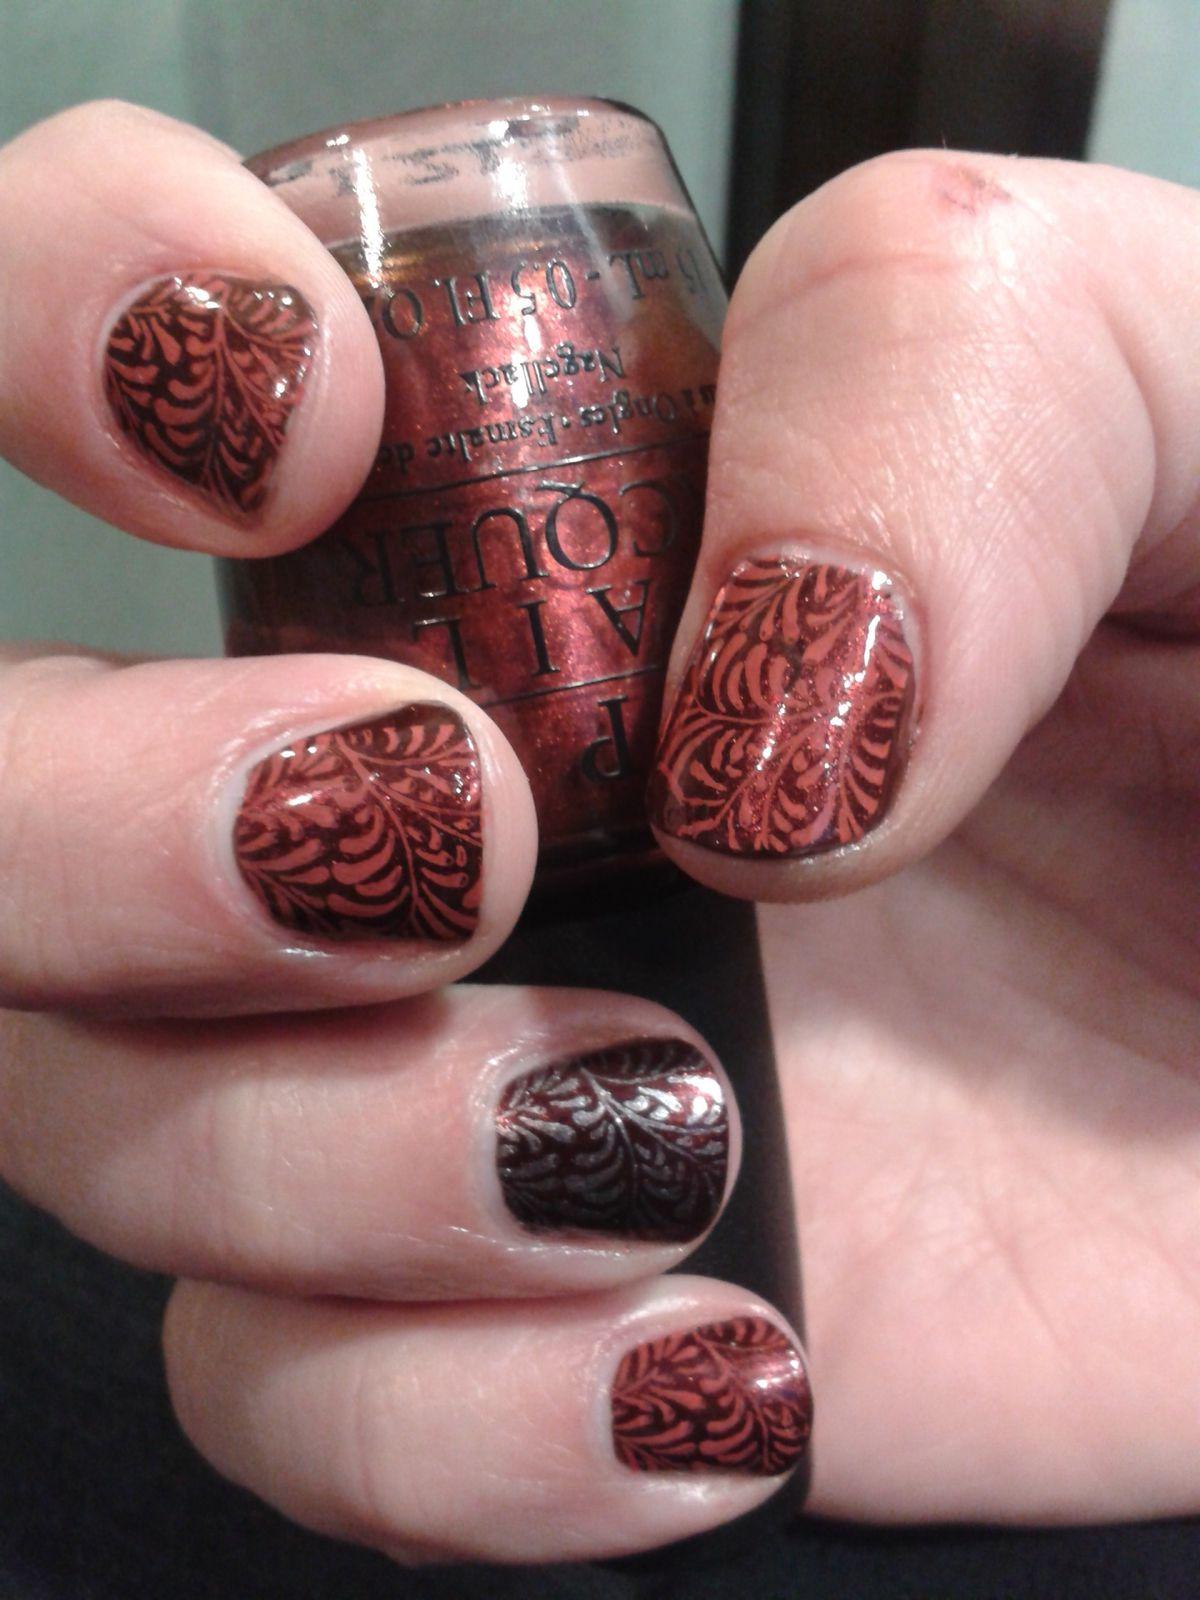 Nail Art Stamping &quot&#x3B;feuillage&quot&#x3B;